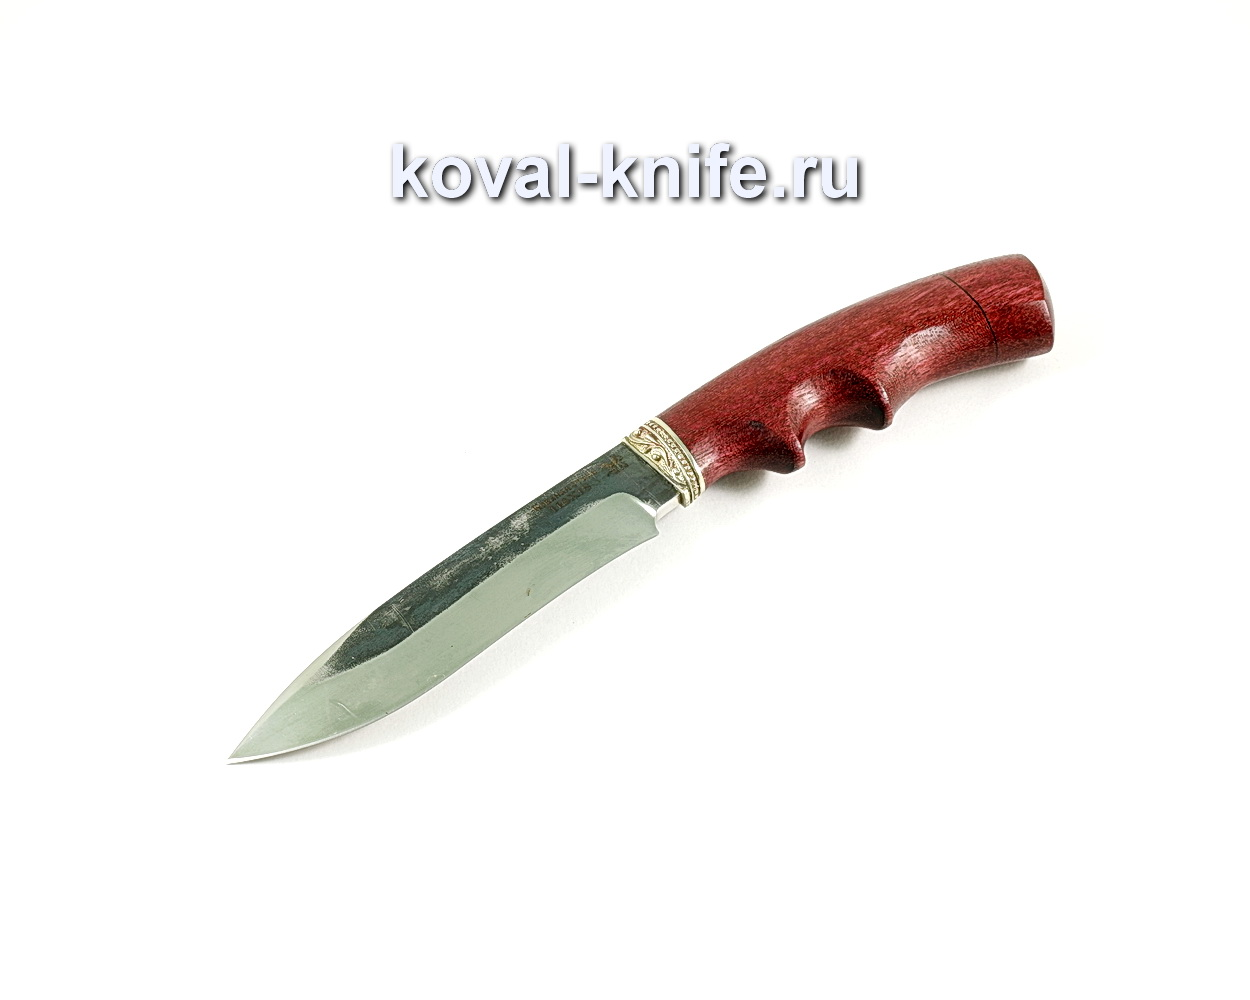 Нож Орлан (сталь 110х18), рукоять амарант, литье